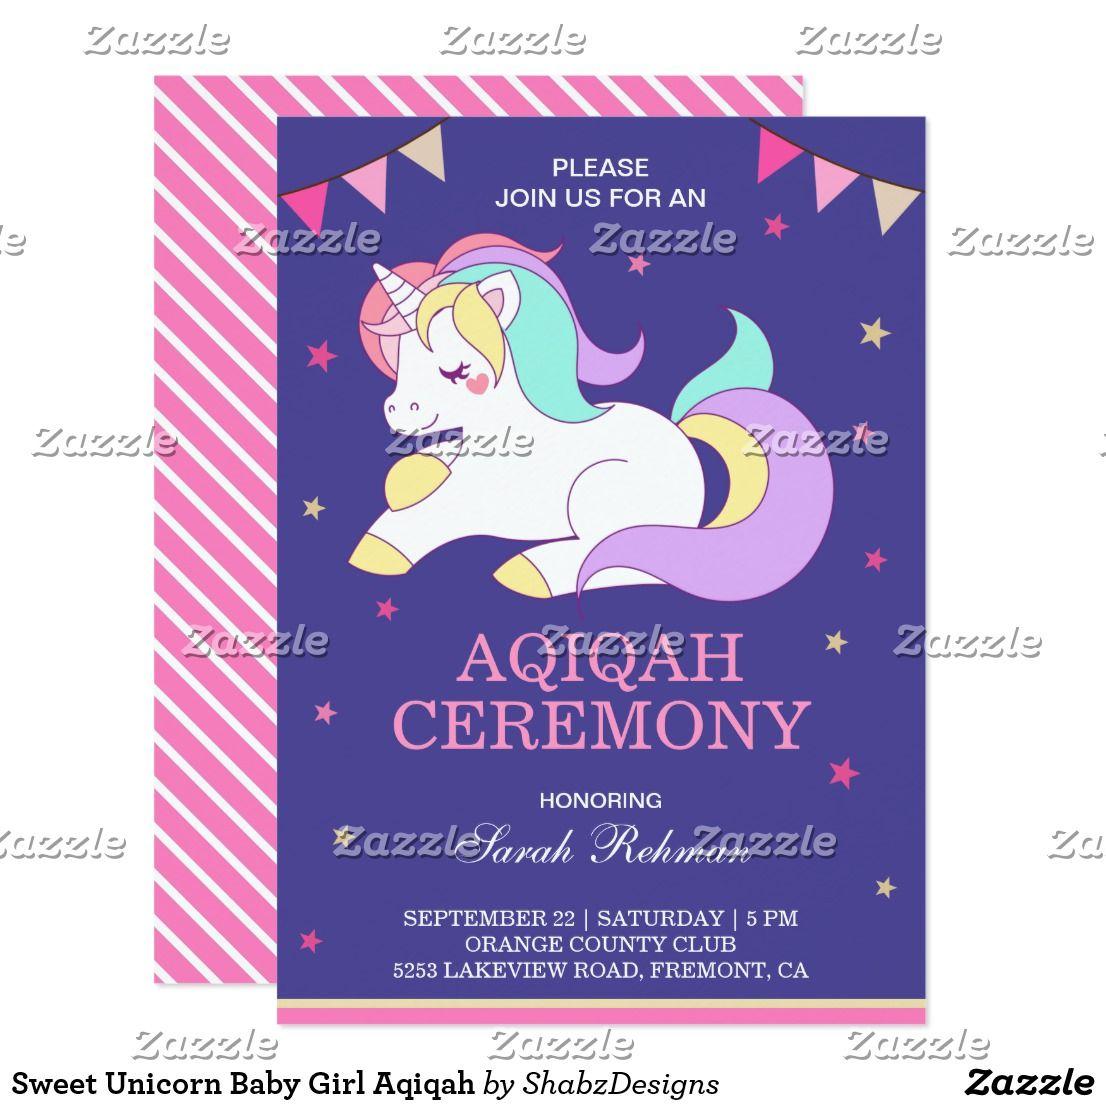 Sweet Unicorn Baby Girl Aqiqah Invitation